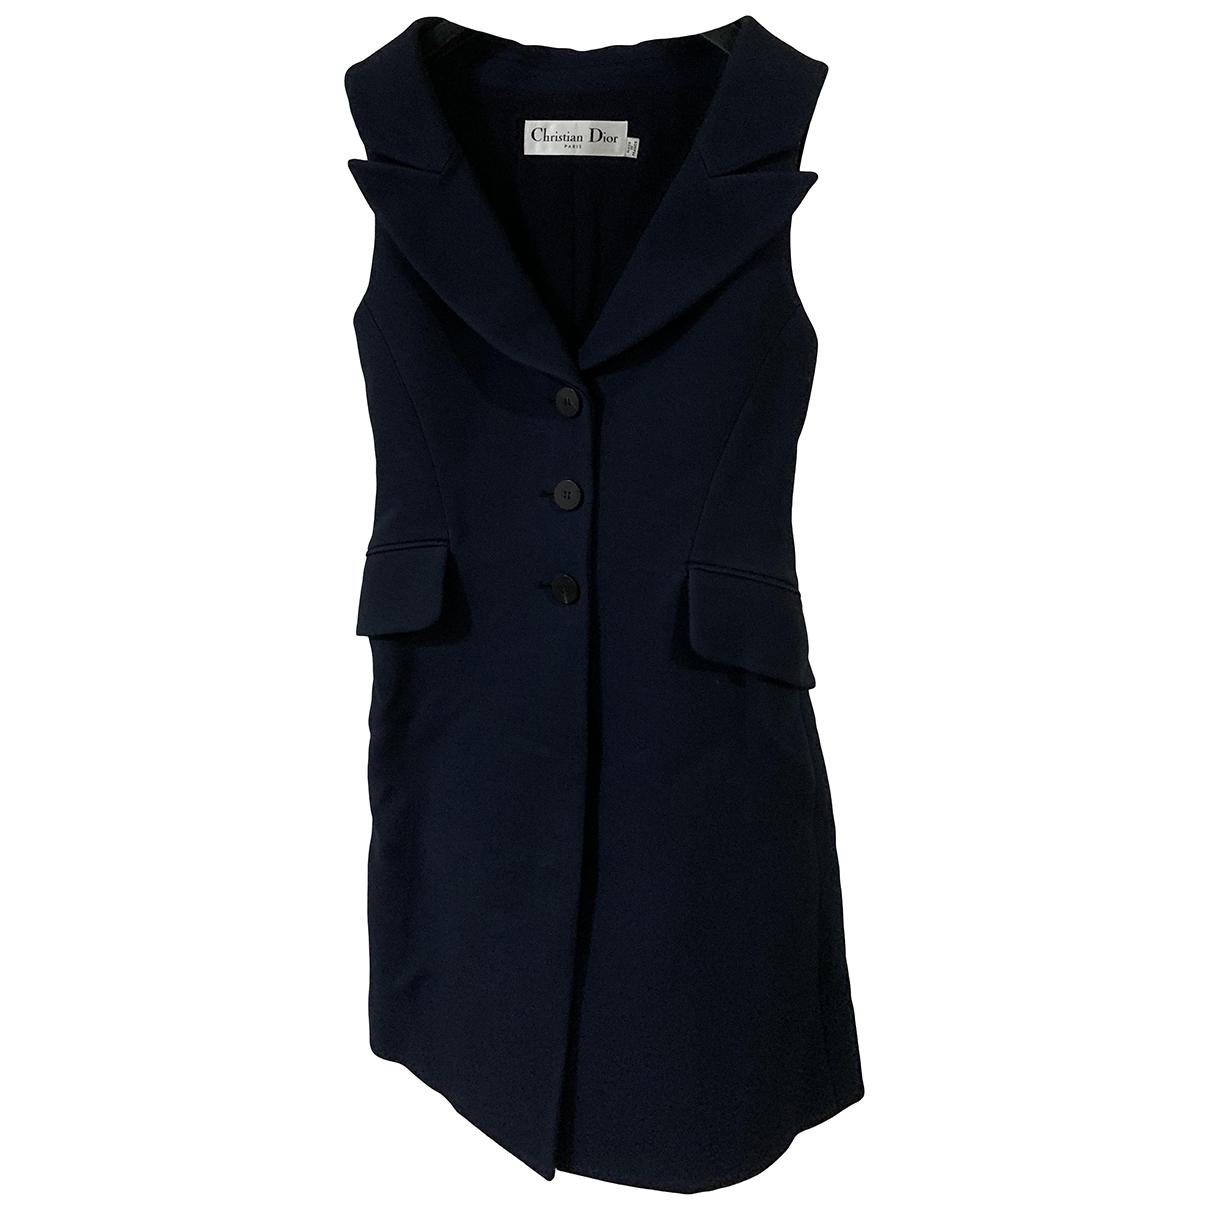 Dior \N Navy Wool dress for Women 34 FR